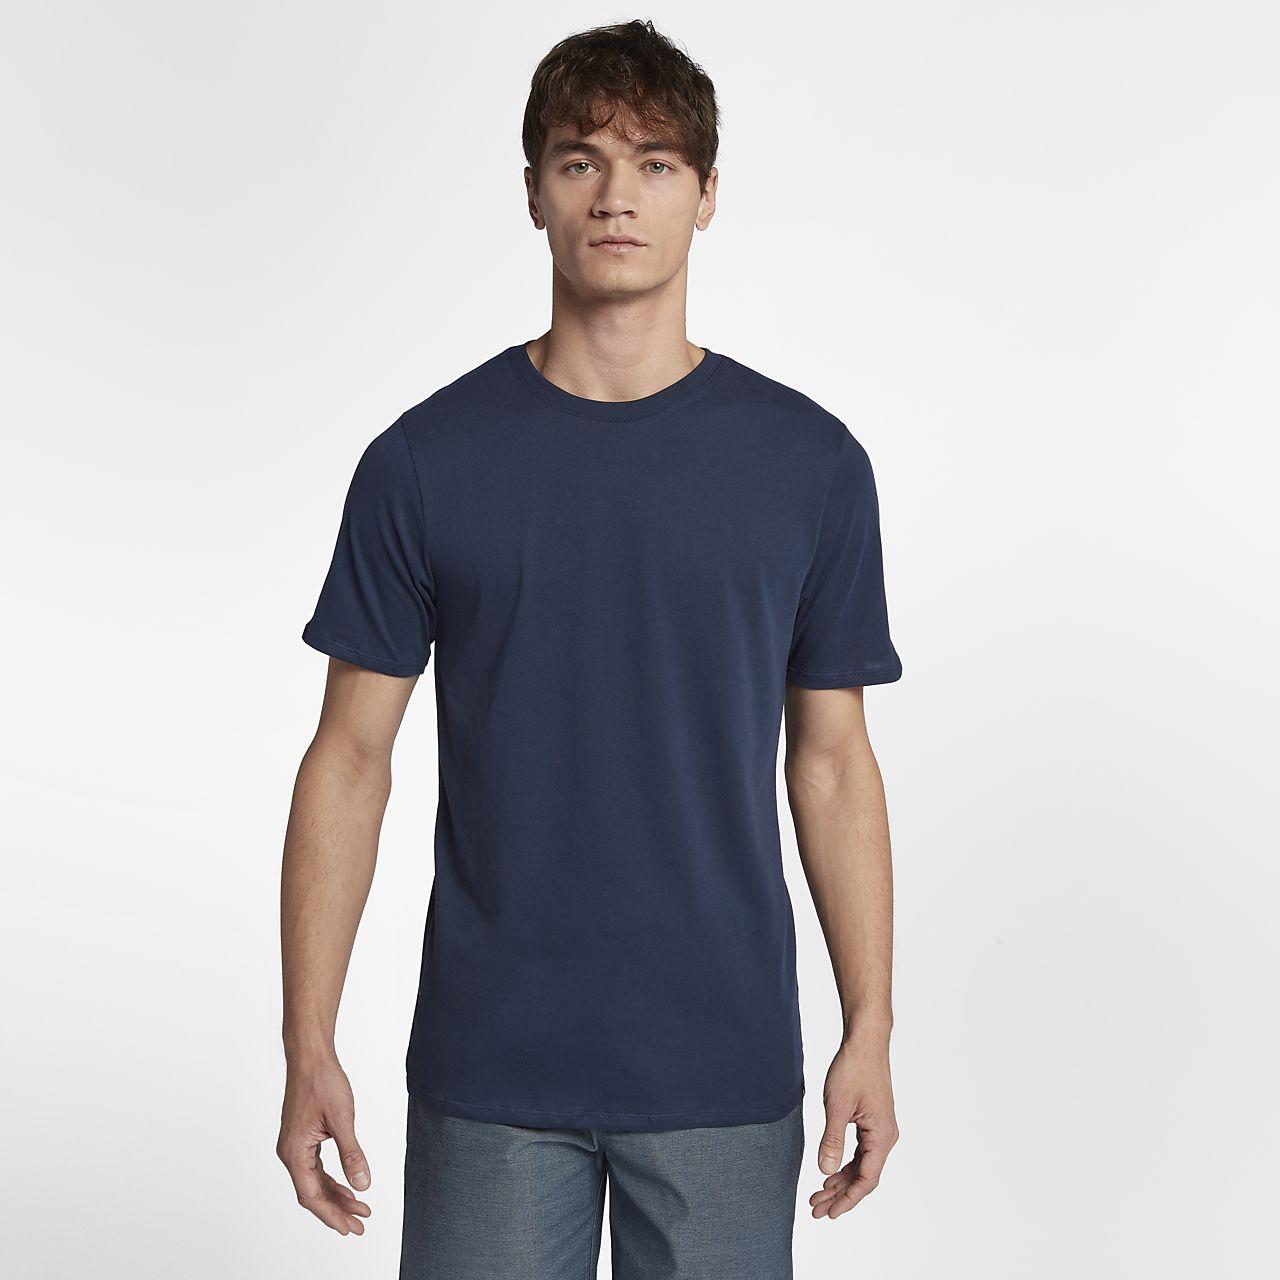 ... Hurley Staple Dri-FIT Men's T-Shirt